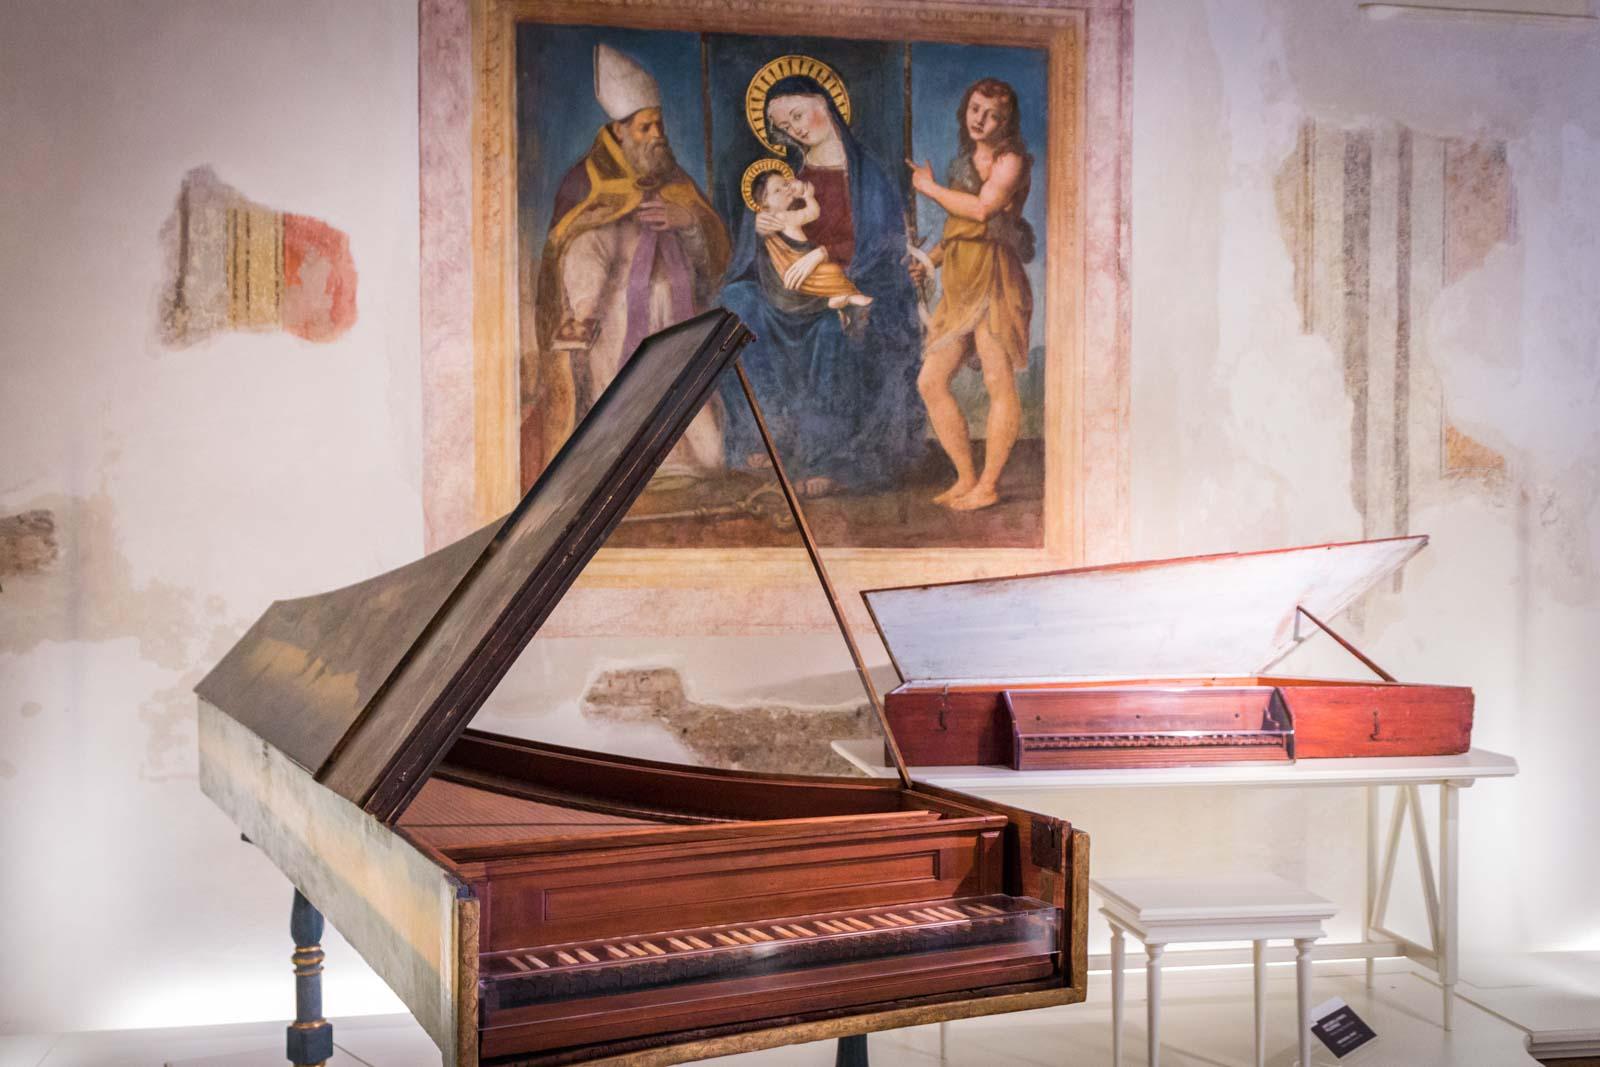 Bologna, International Music Library | Ph. Michael Turtle